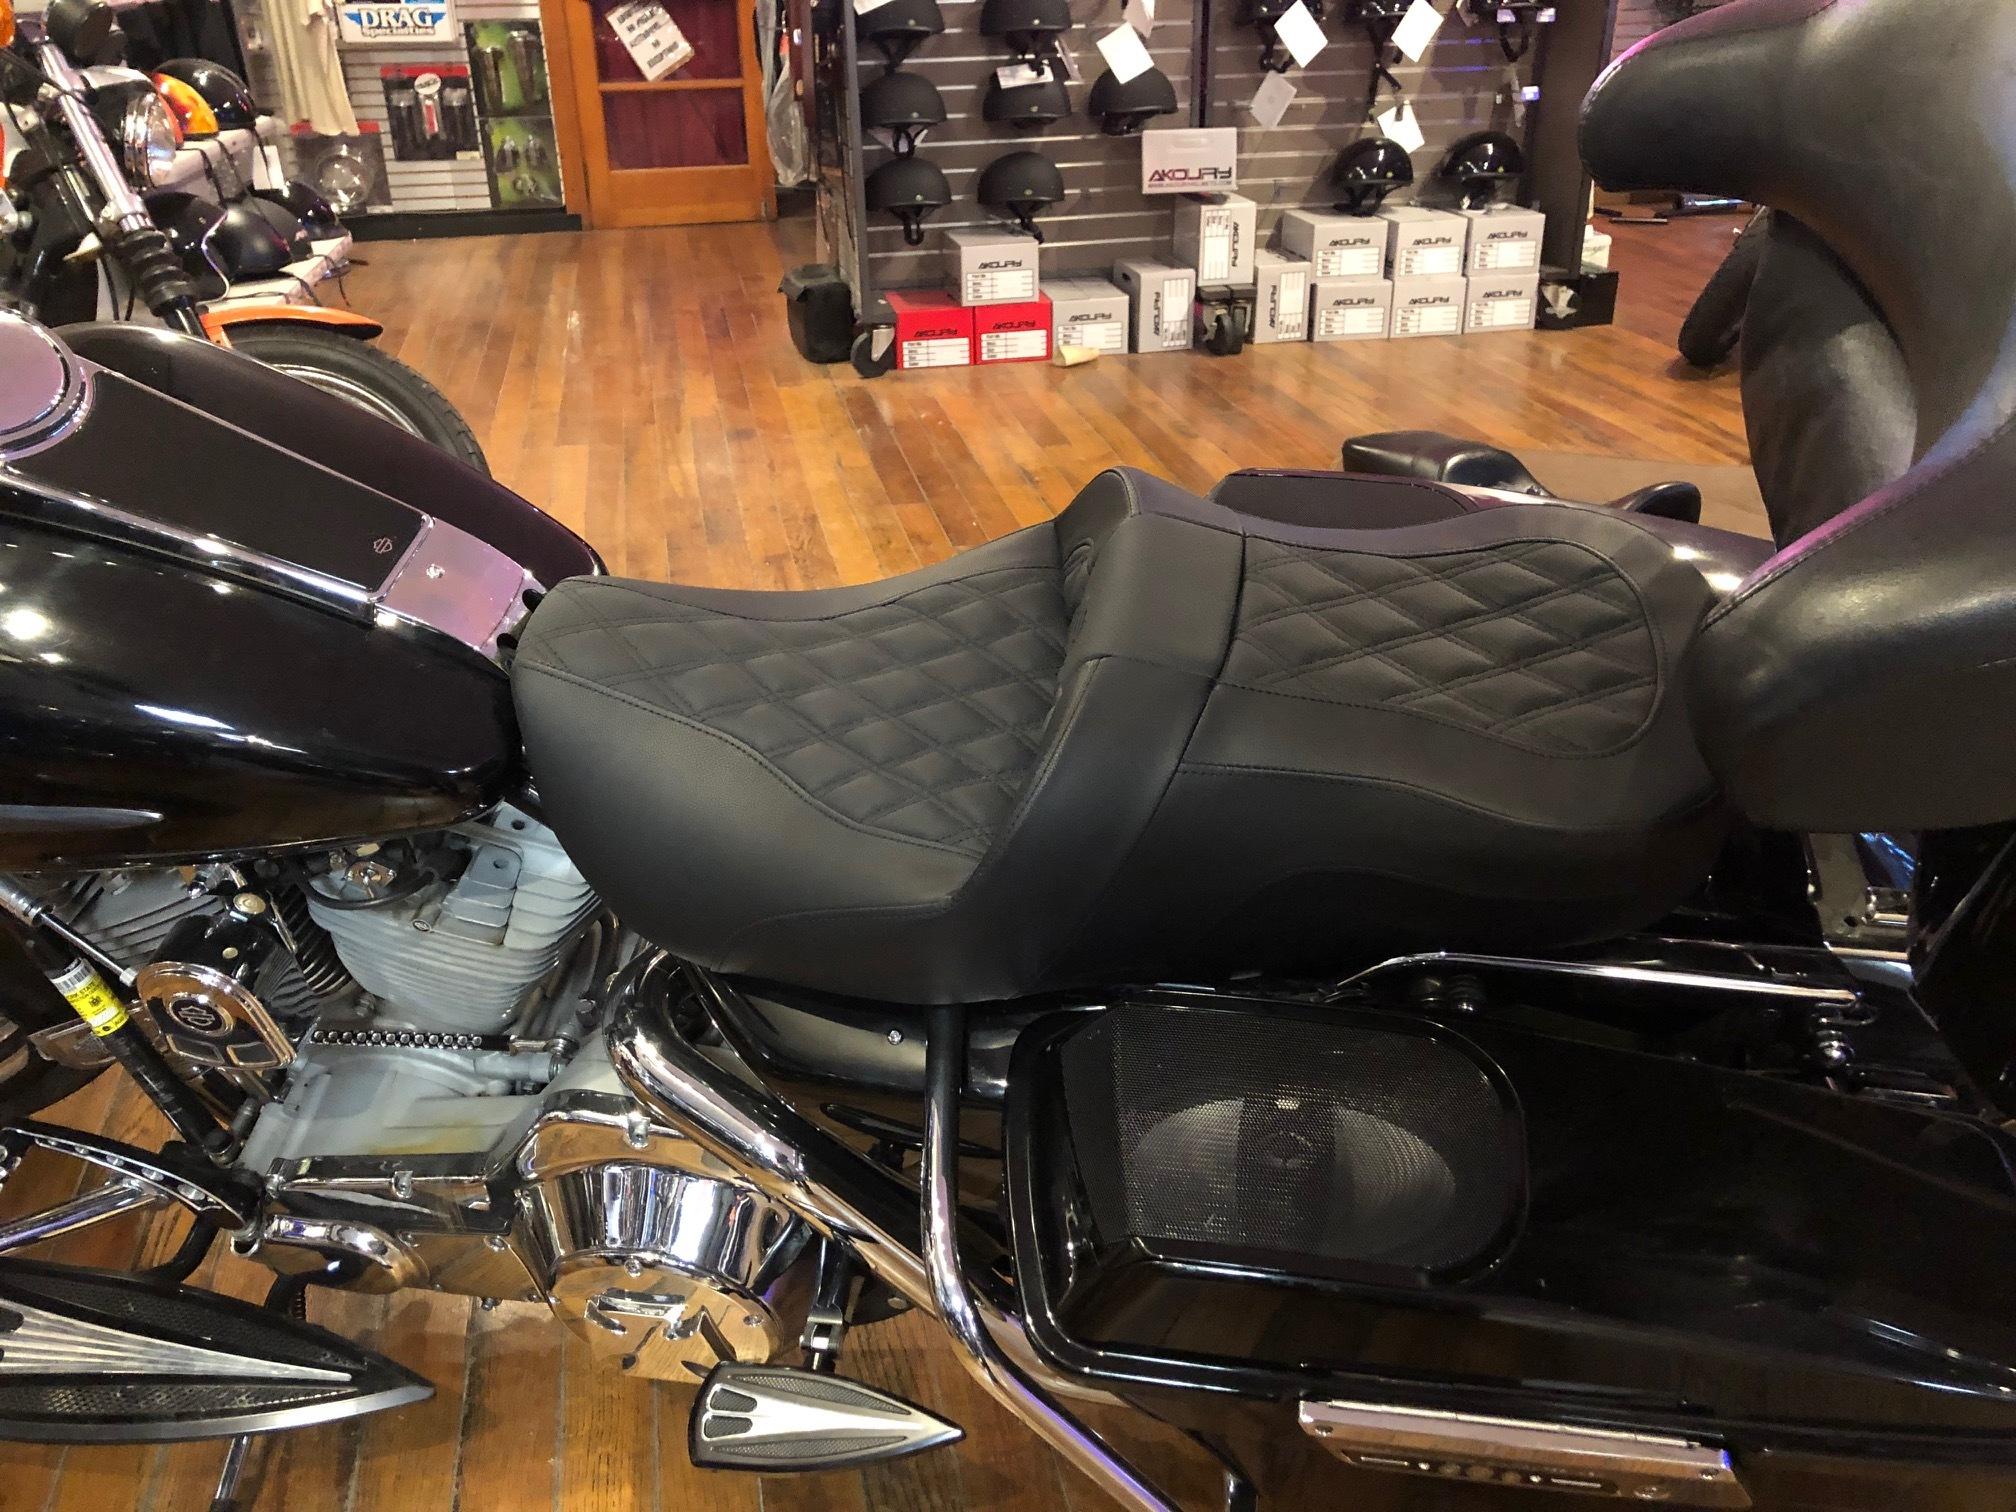 Marvelous Saddlemen Black Leather Road Sofa Lattice Seat For 97 06 Harley Touring Flhr Home Interior And Landscaping Ologienasavecom